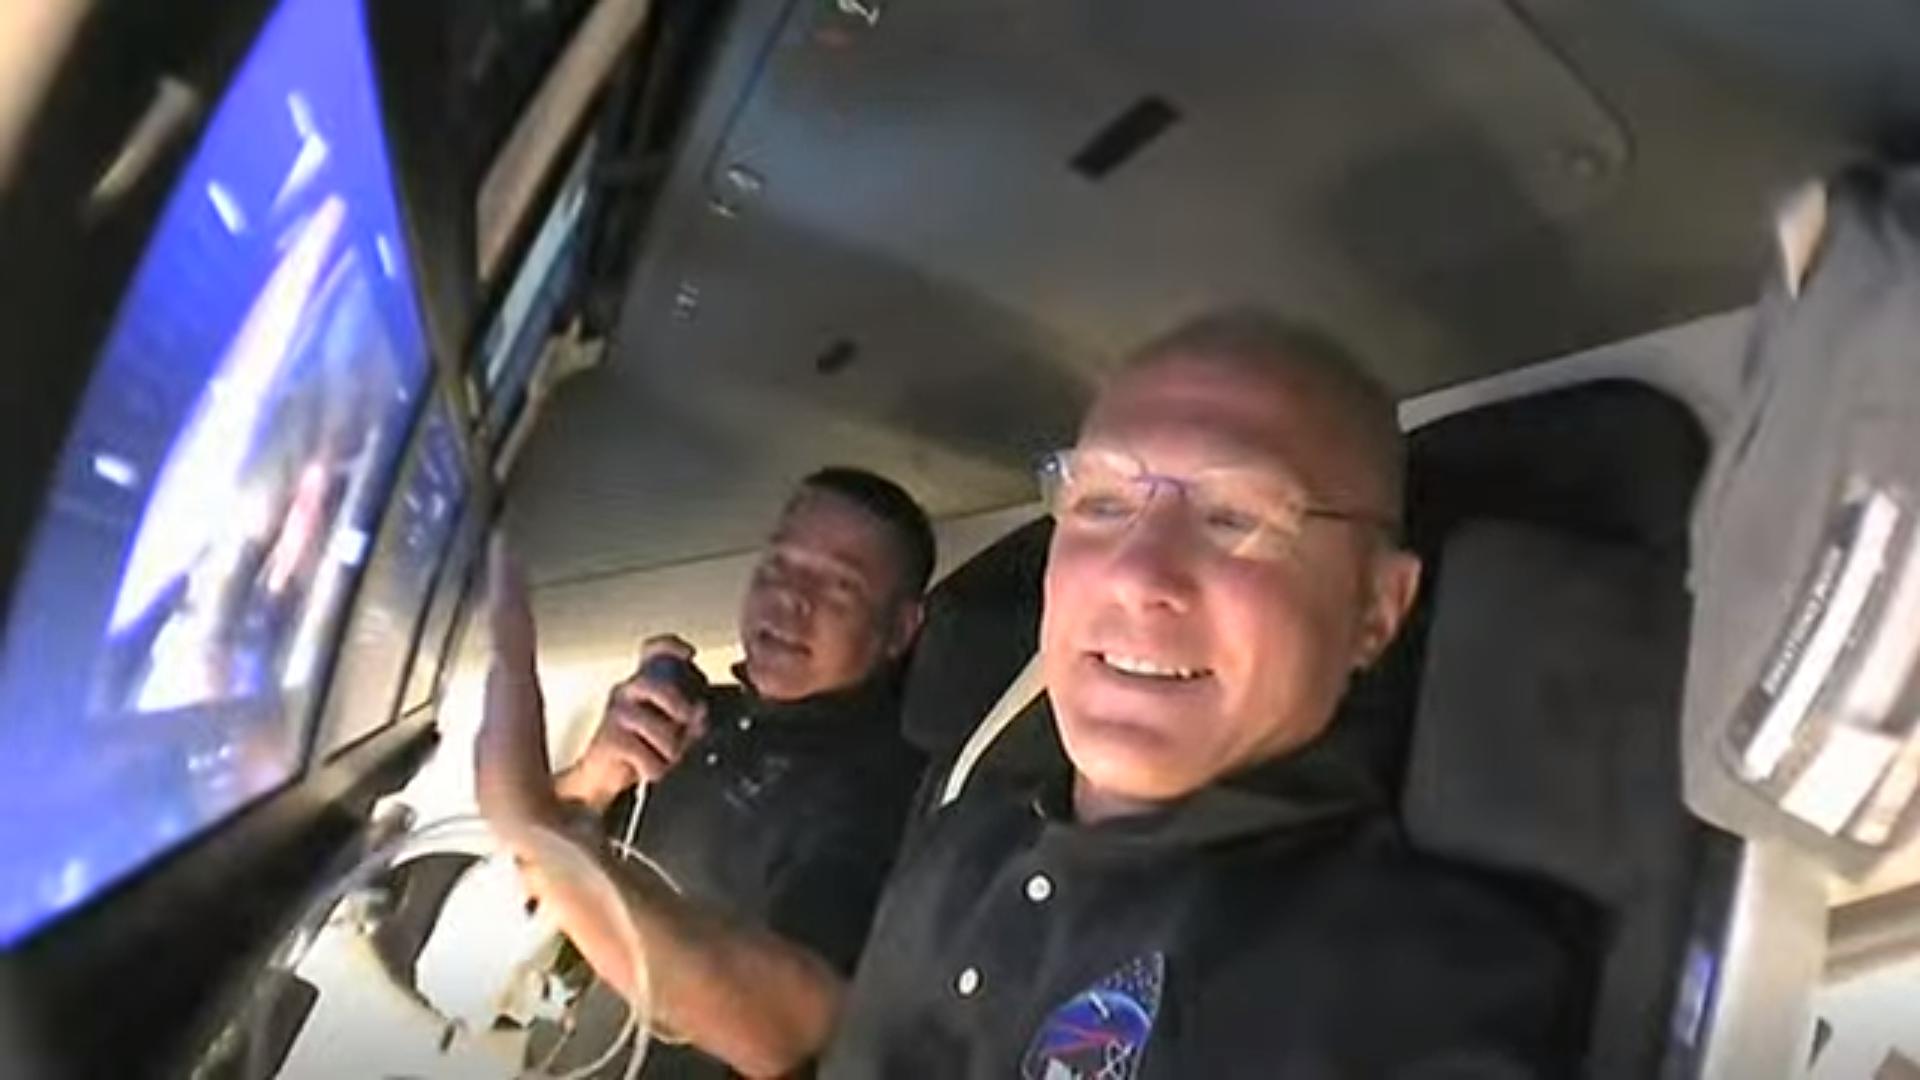 Tour SpaceX's Crew Dragon spaceship in orbit with NASA's Demo-2 astronauts (video)